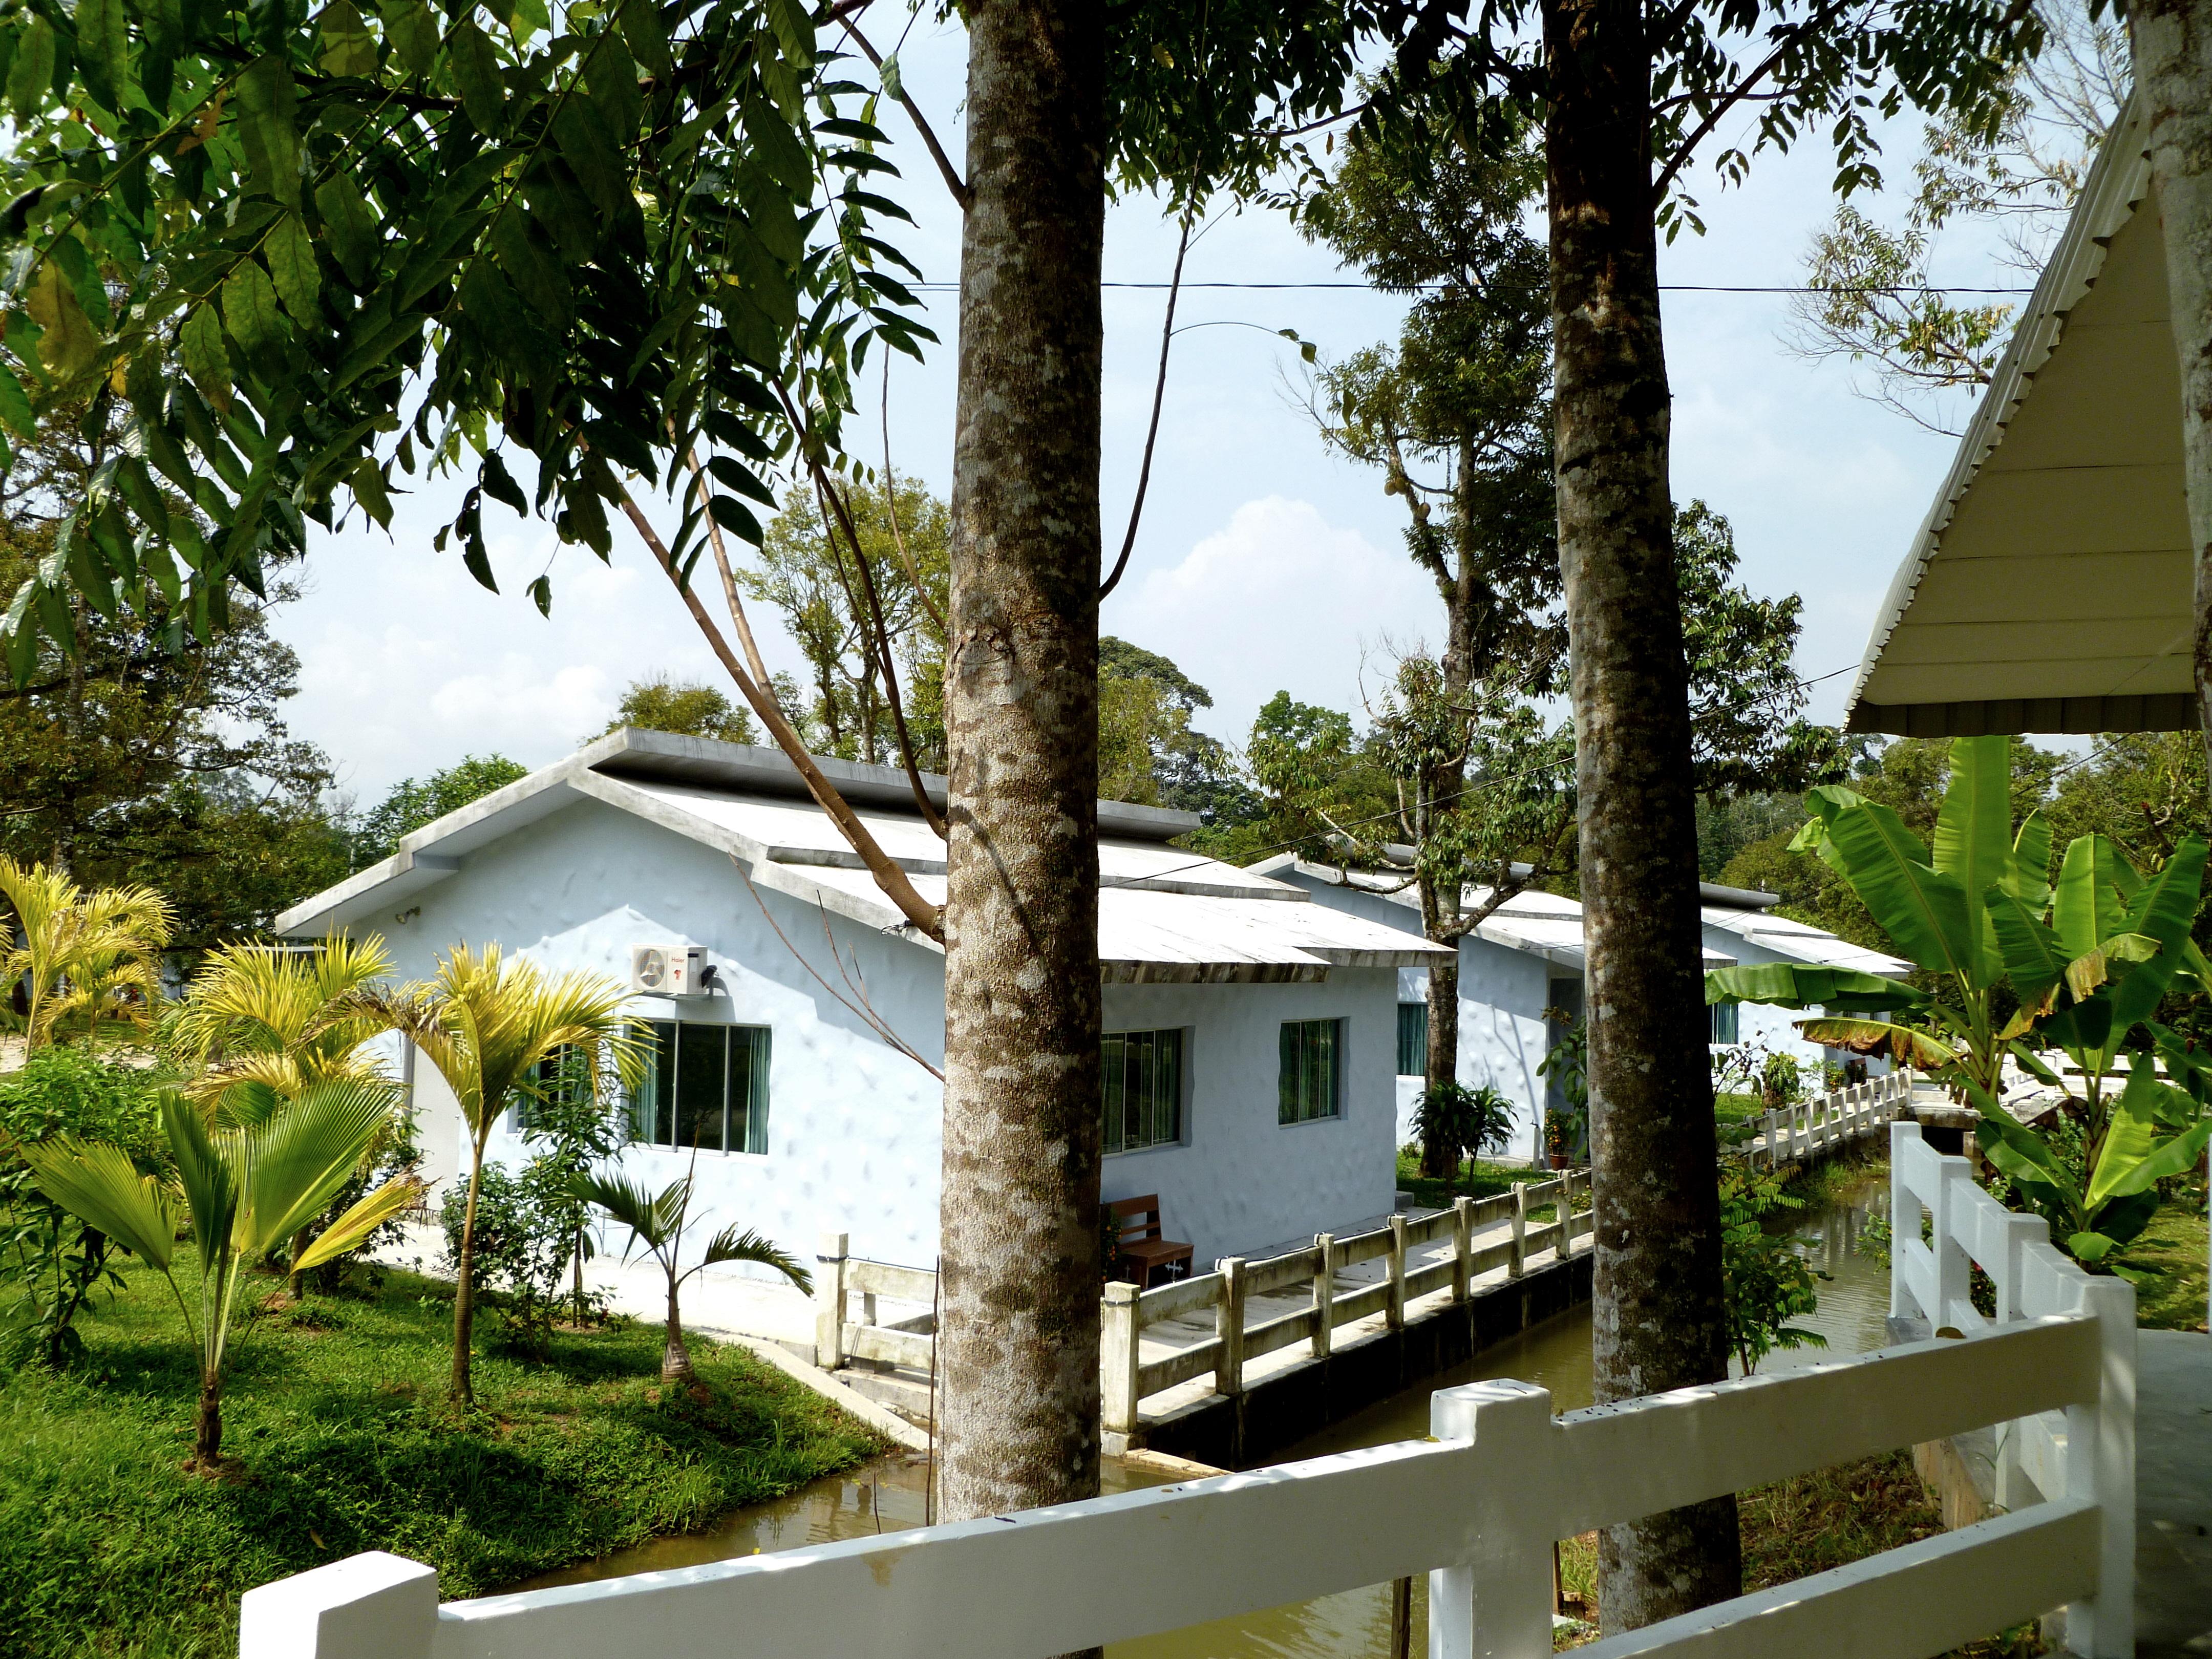 Tanjung Malim Malaysia  City new picture : jungles of Kalumpang, Tanjung Malim | WHOA! Adventures | Best Malaysia ...